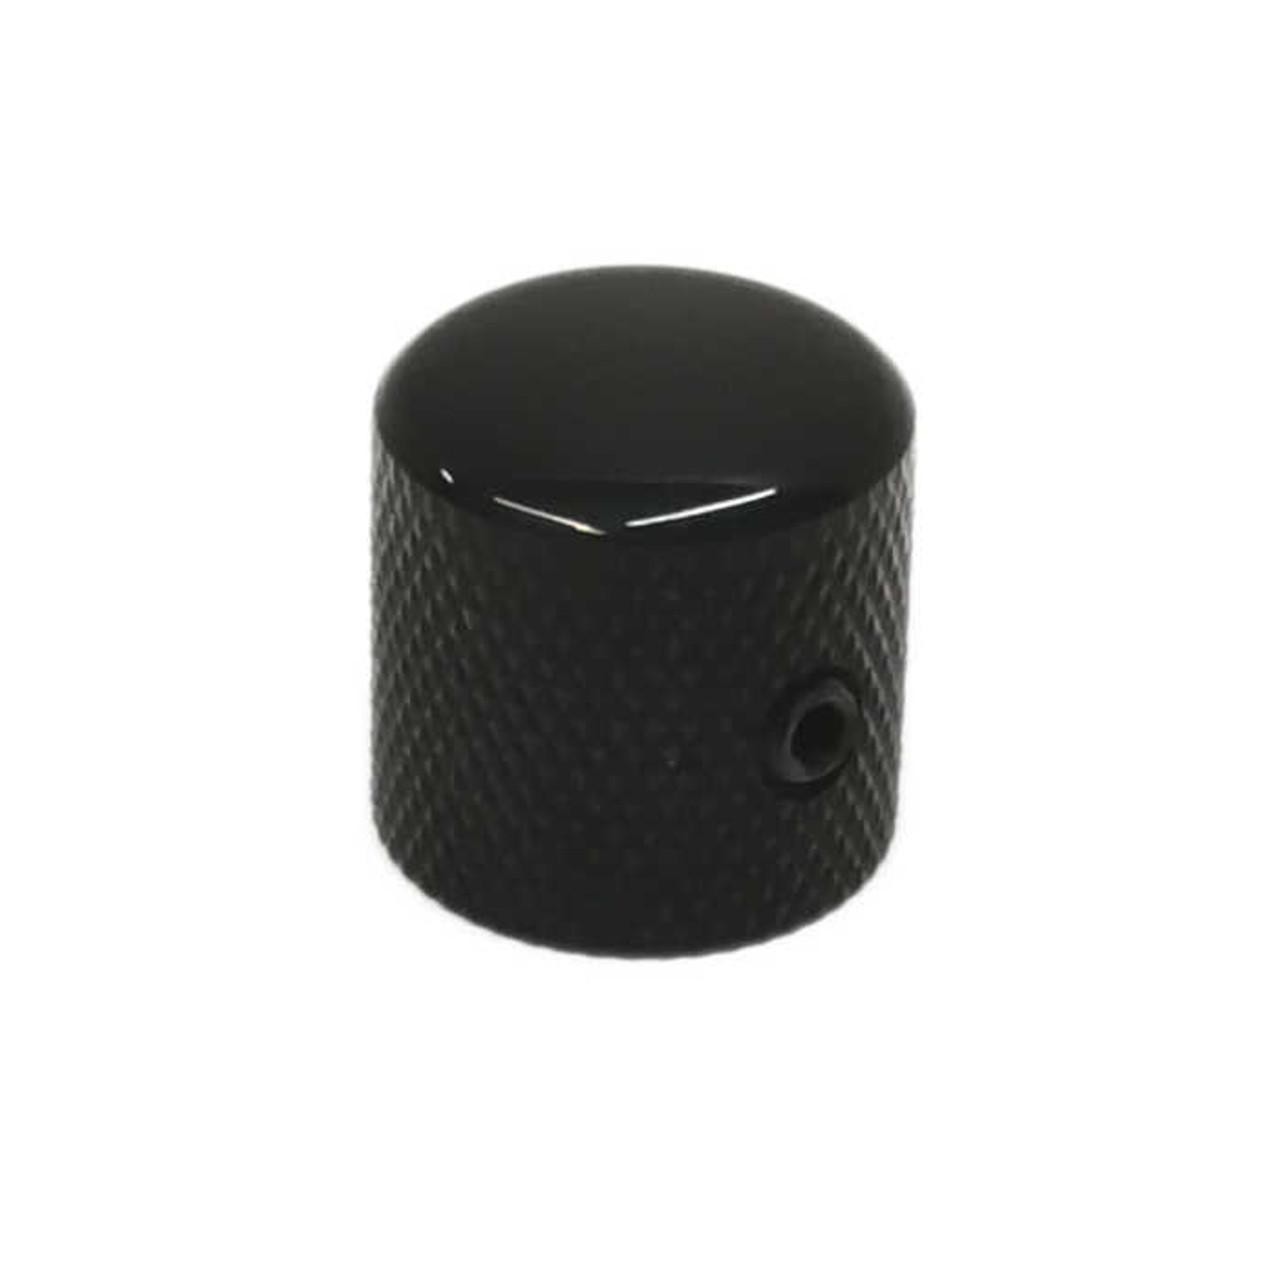 Dome Knob for Split Shaft - Black